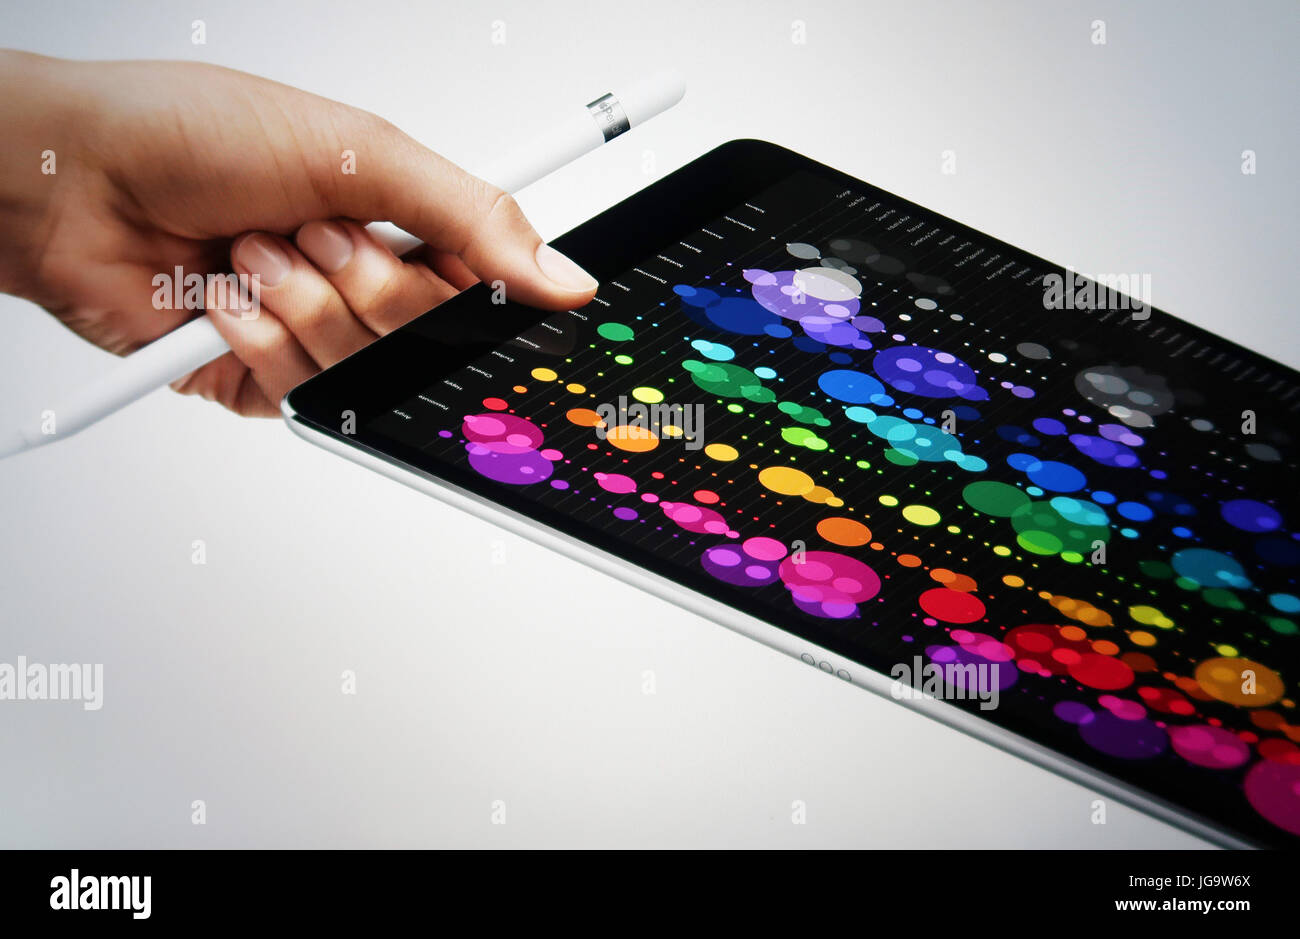 Apple iPad Pro 10.5' - Stock Image